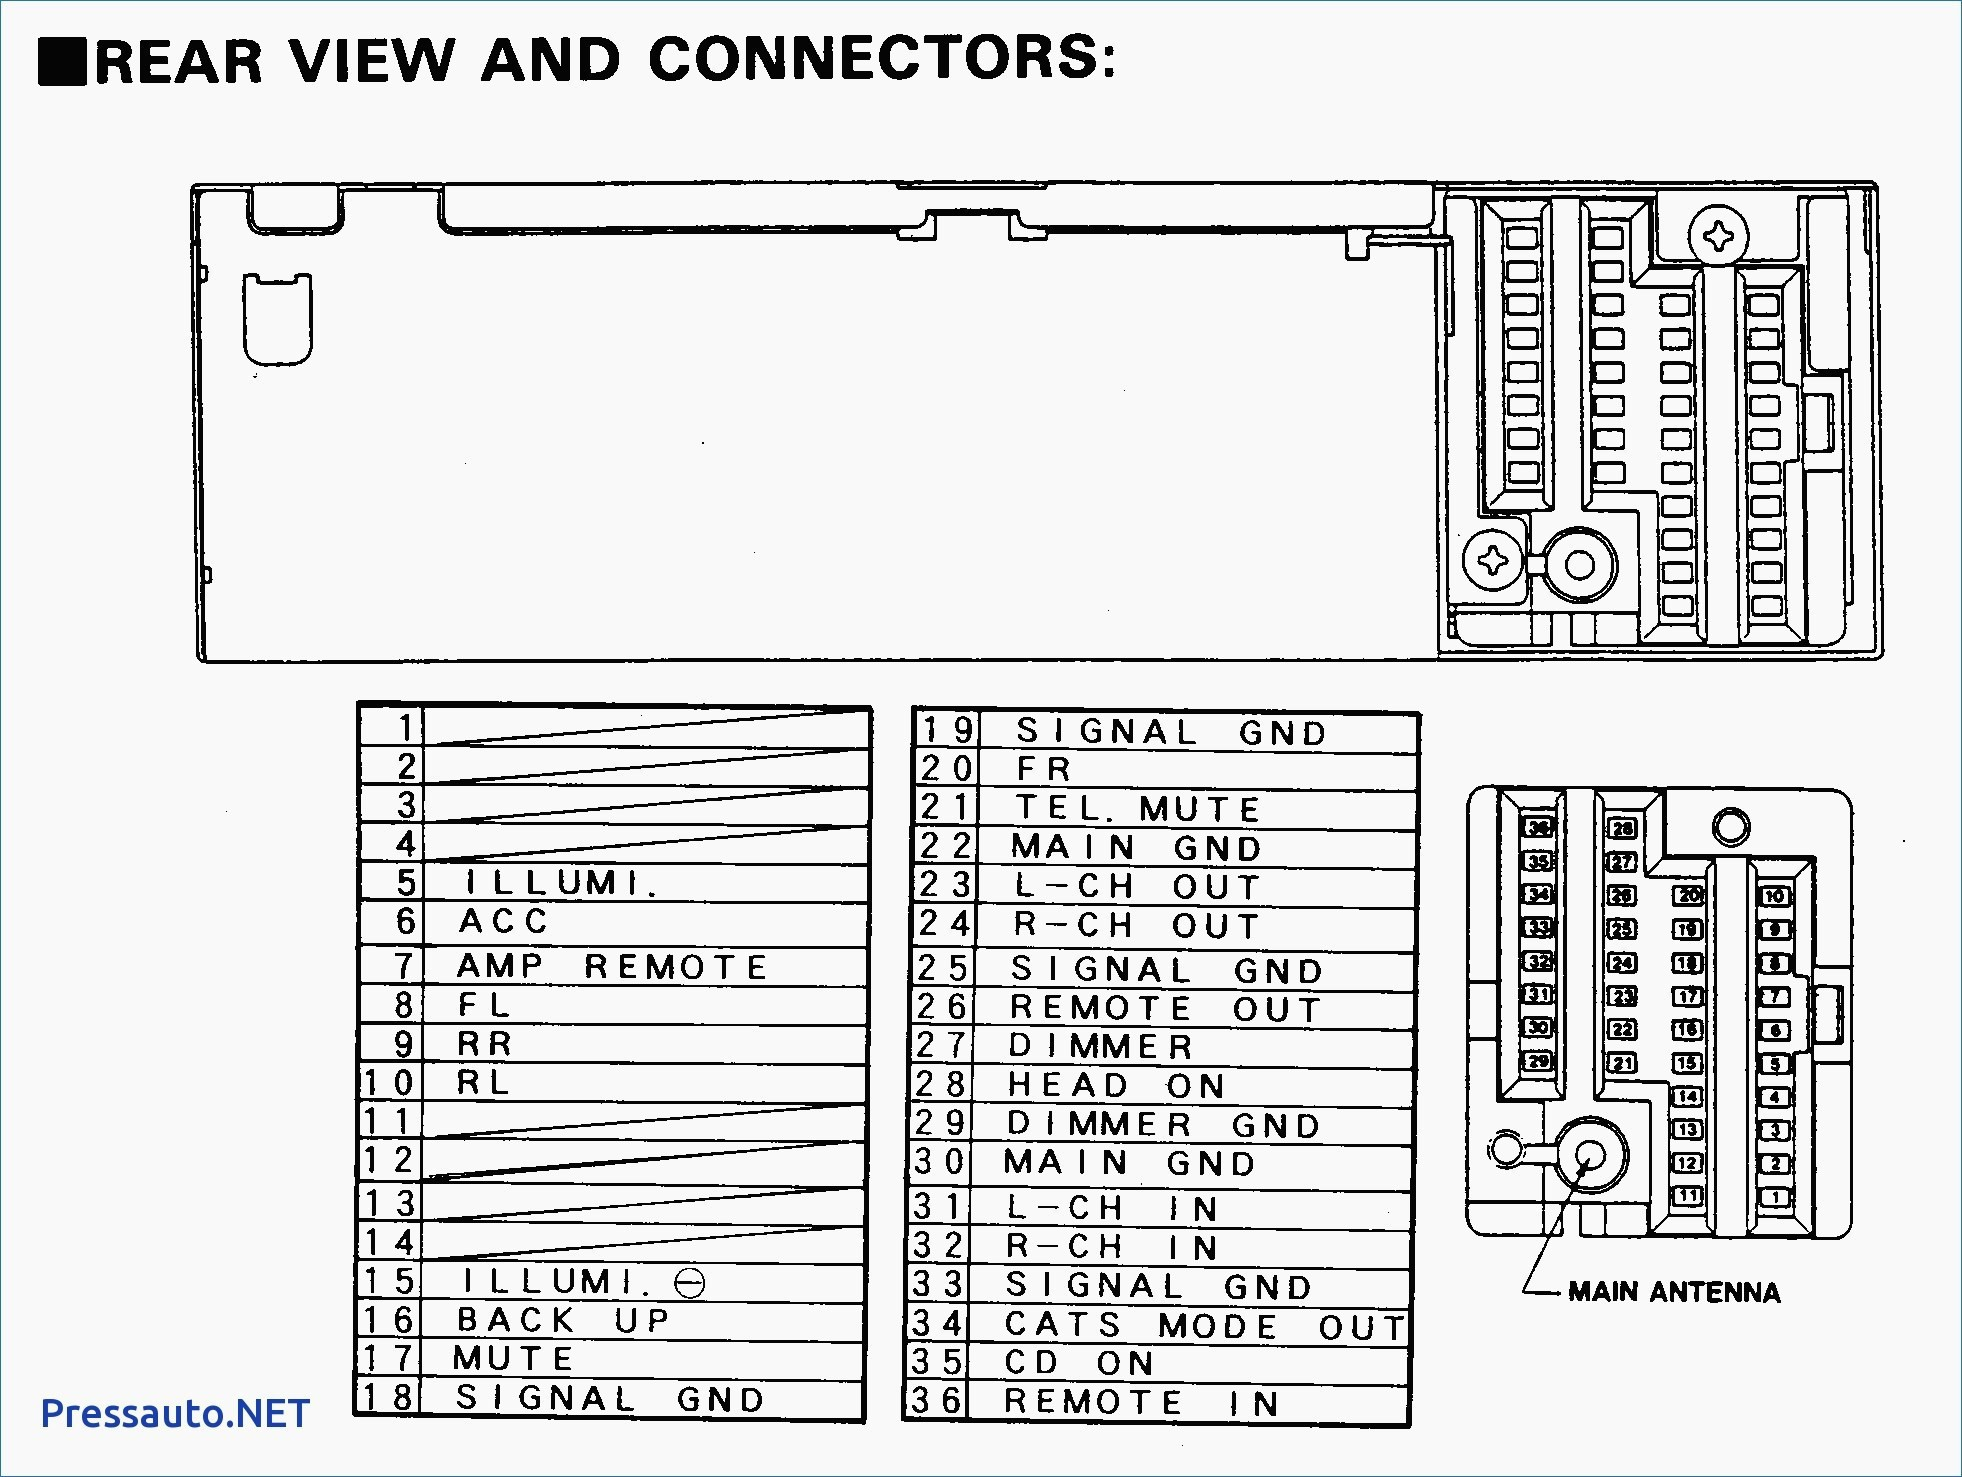 Car Stereo Hook Up Diagram Wiring Diagram Car Stereo Valid Amplifier Wiring Diagram Of Car Stereo Hook Up Diagram